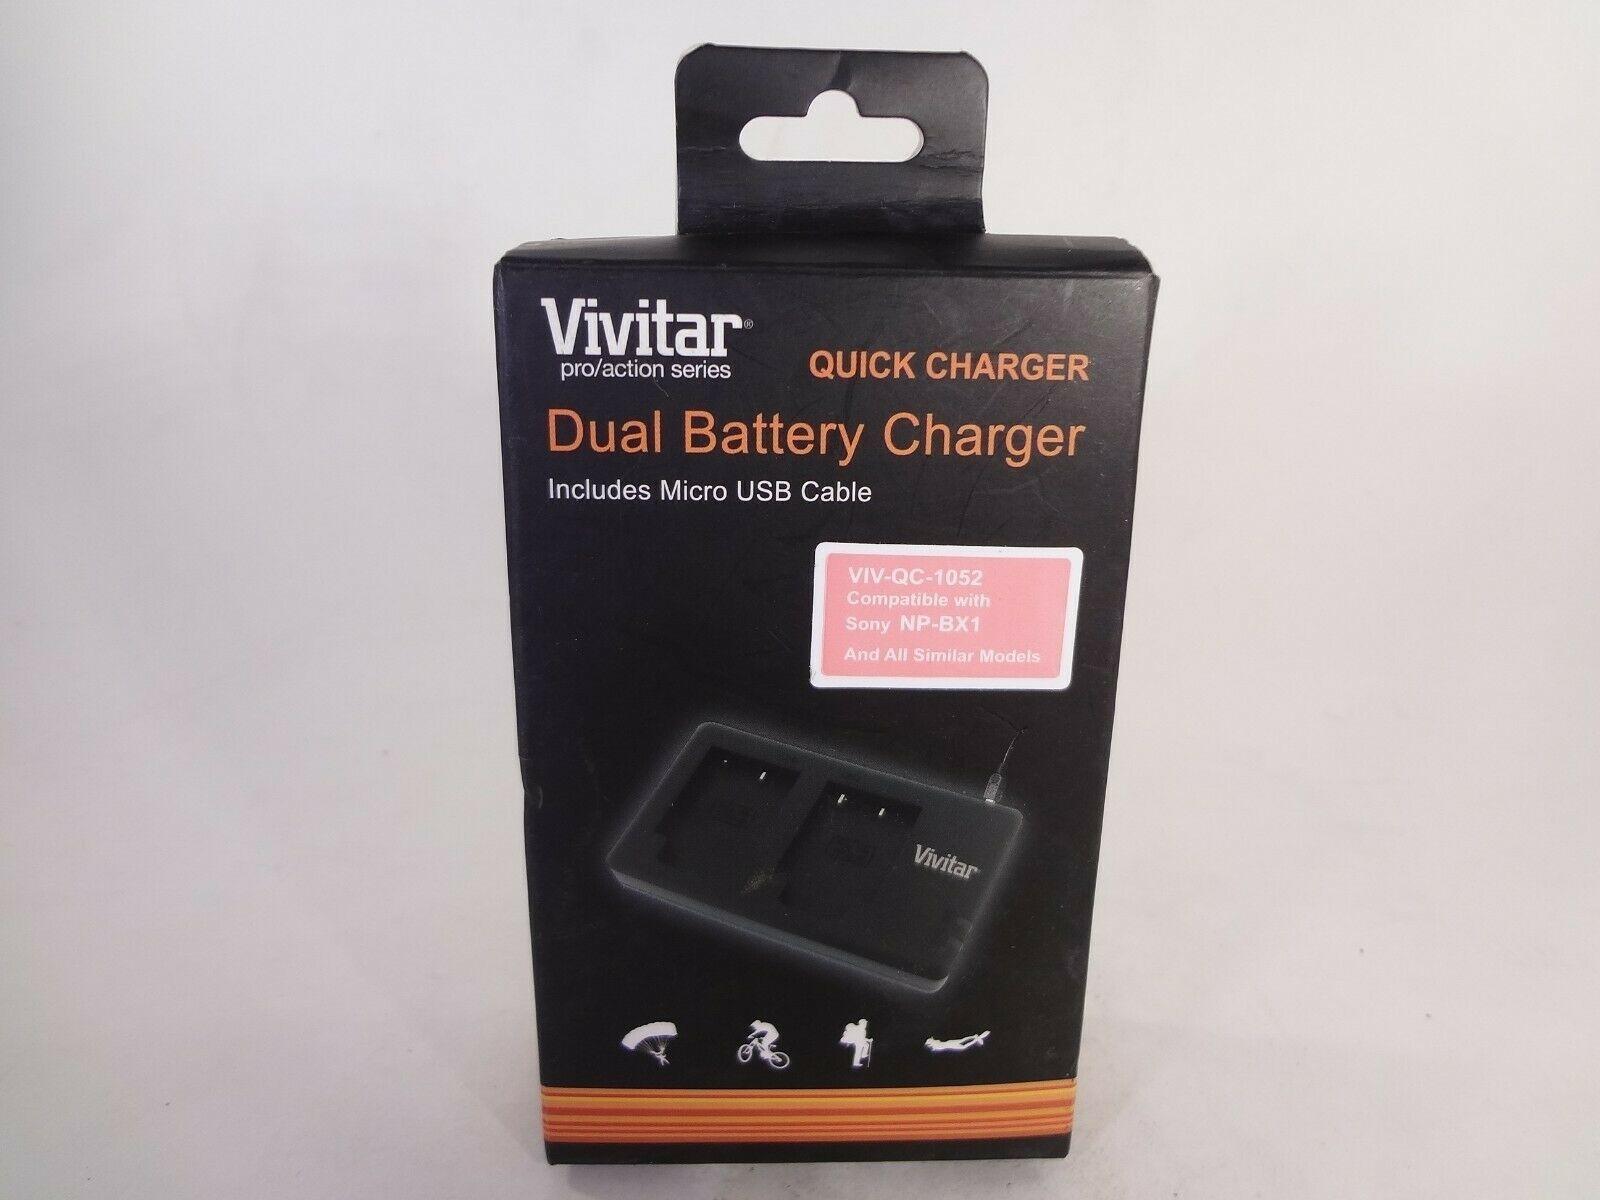 Vivitar Quick Charger Dual Battery Charger VIV-QC-1052 [EH-V] - $14.03